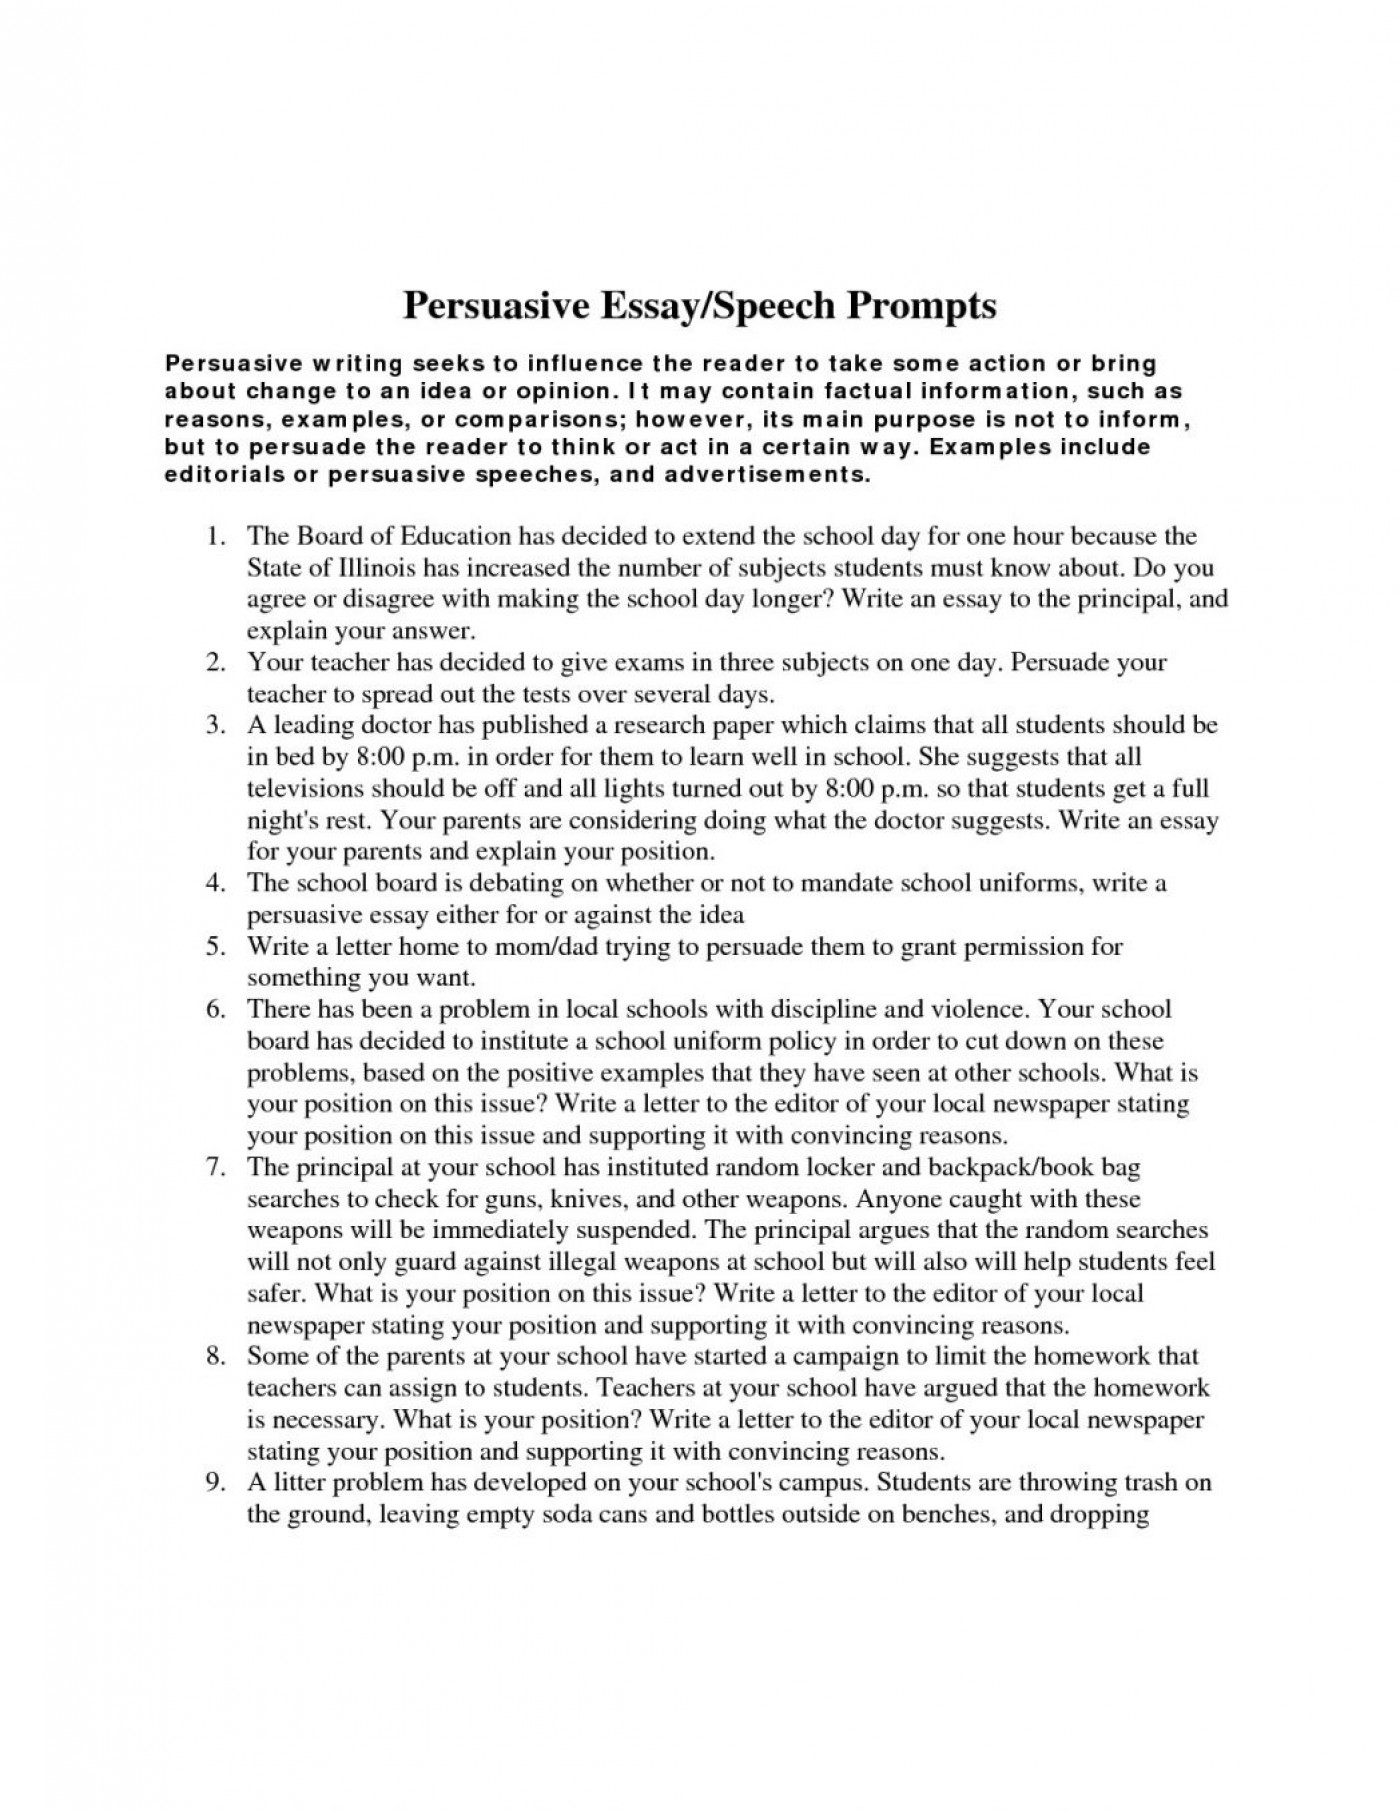 003 Good Debate Essay Topics Original Argumentative Persuasive Pr 1048x1356 Marvelous Prompts High School 1400